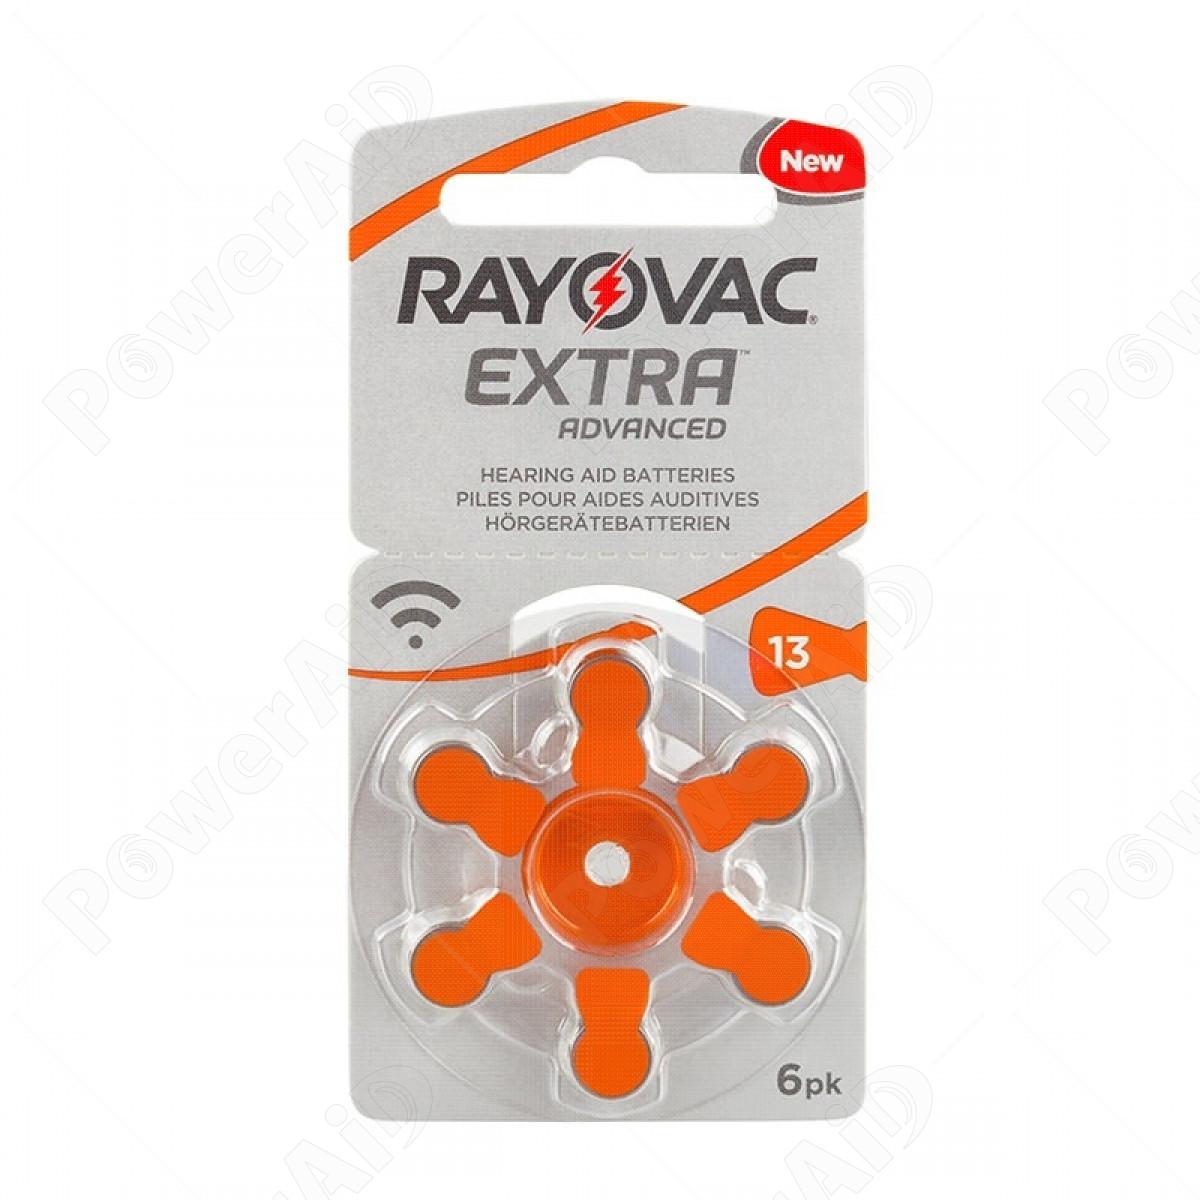 Rayovac - Blister 6 pile Acustiche Extra Advanced 13